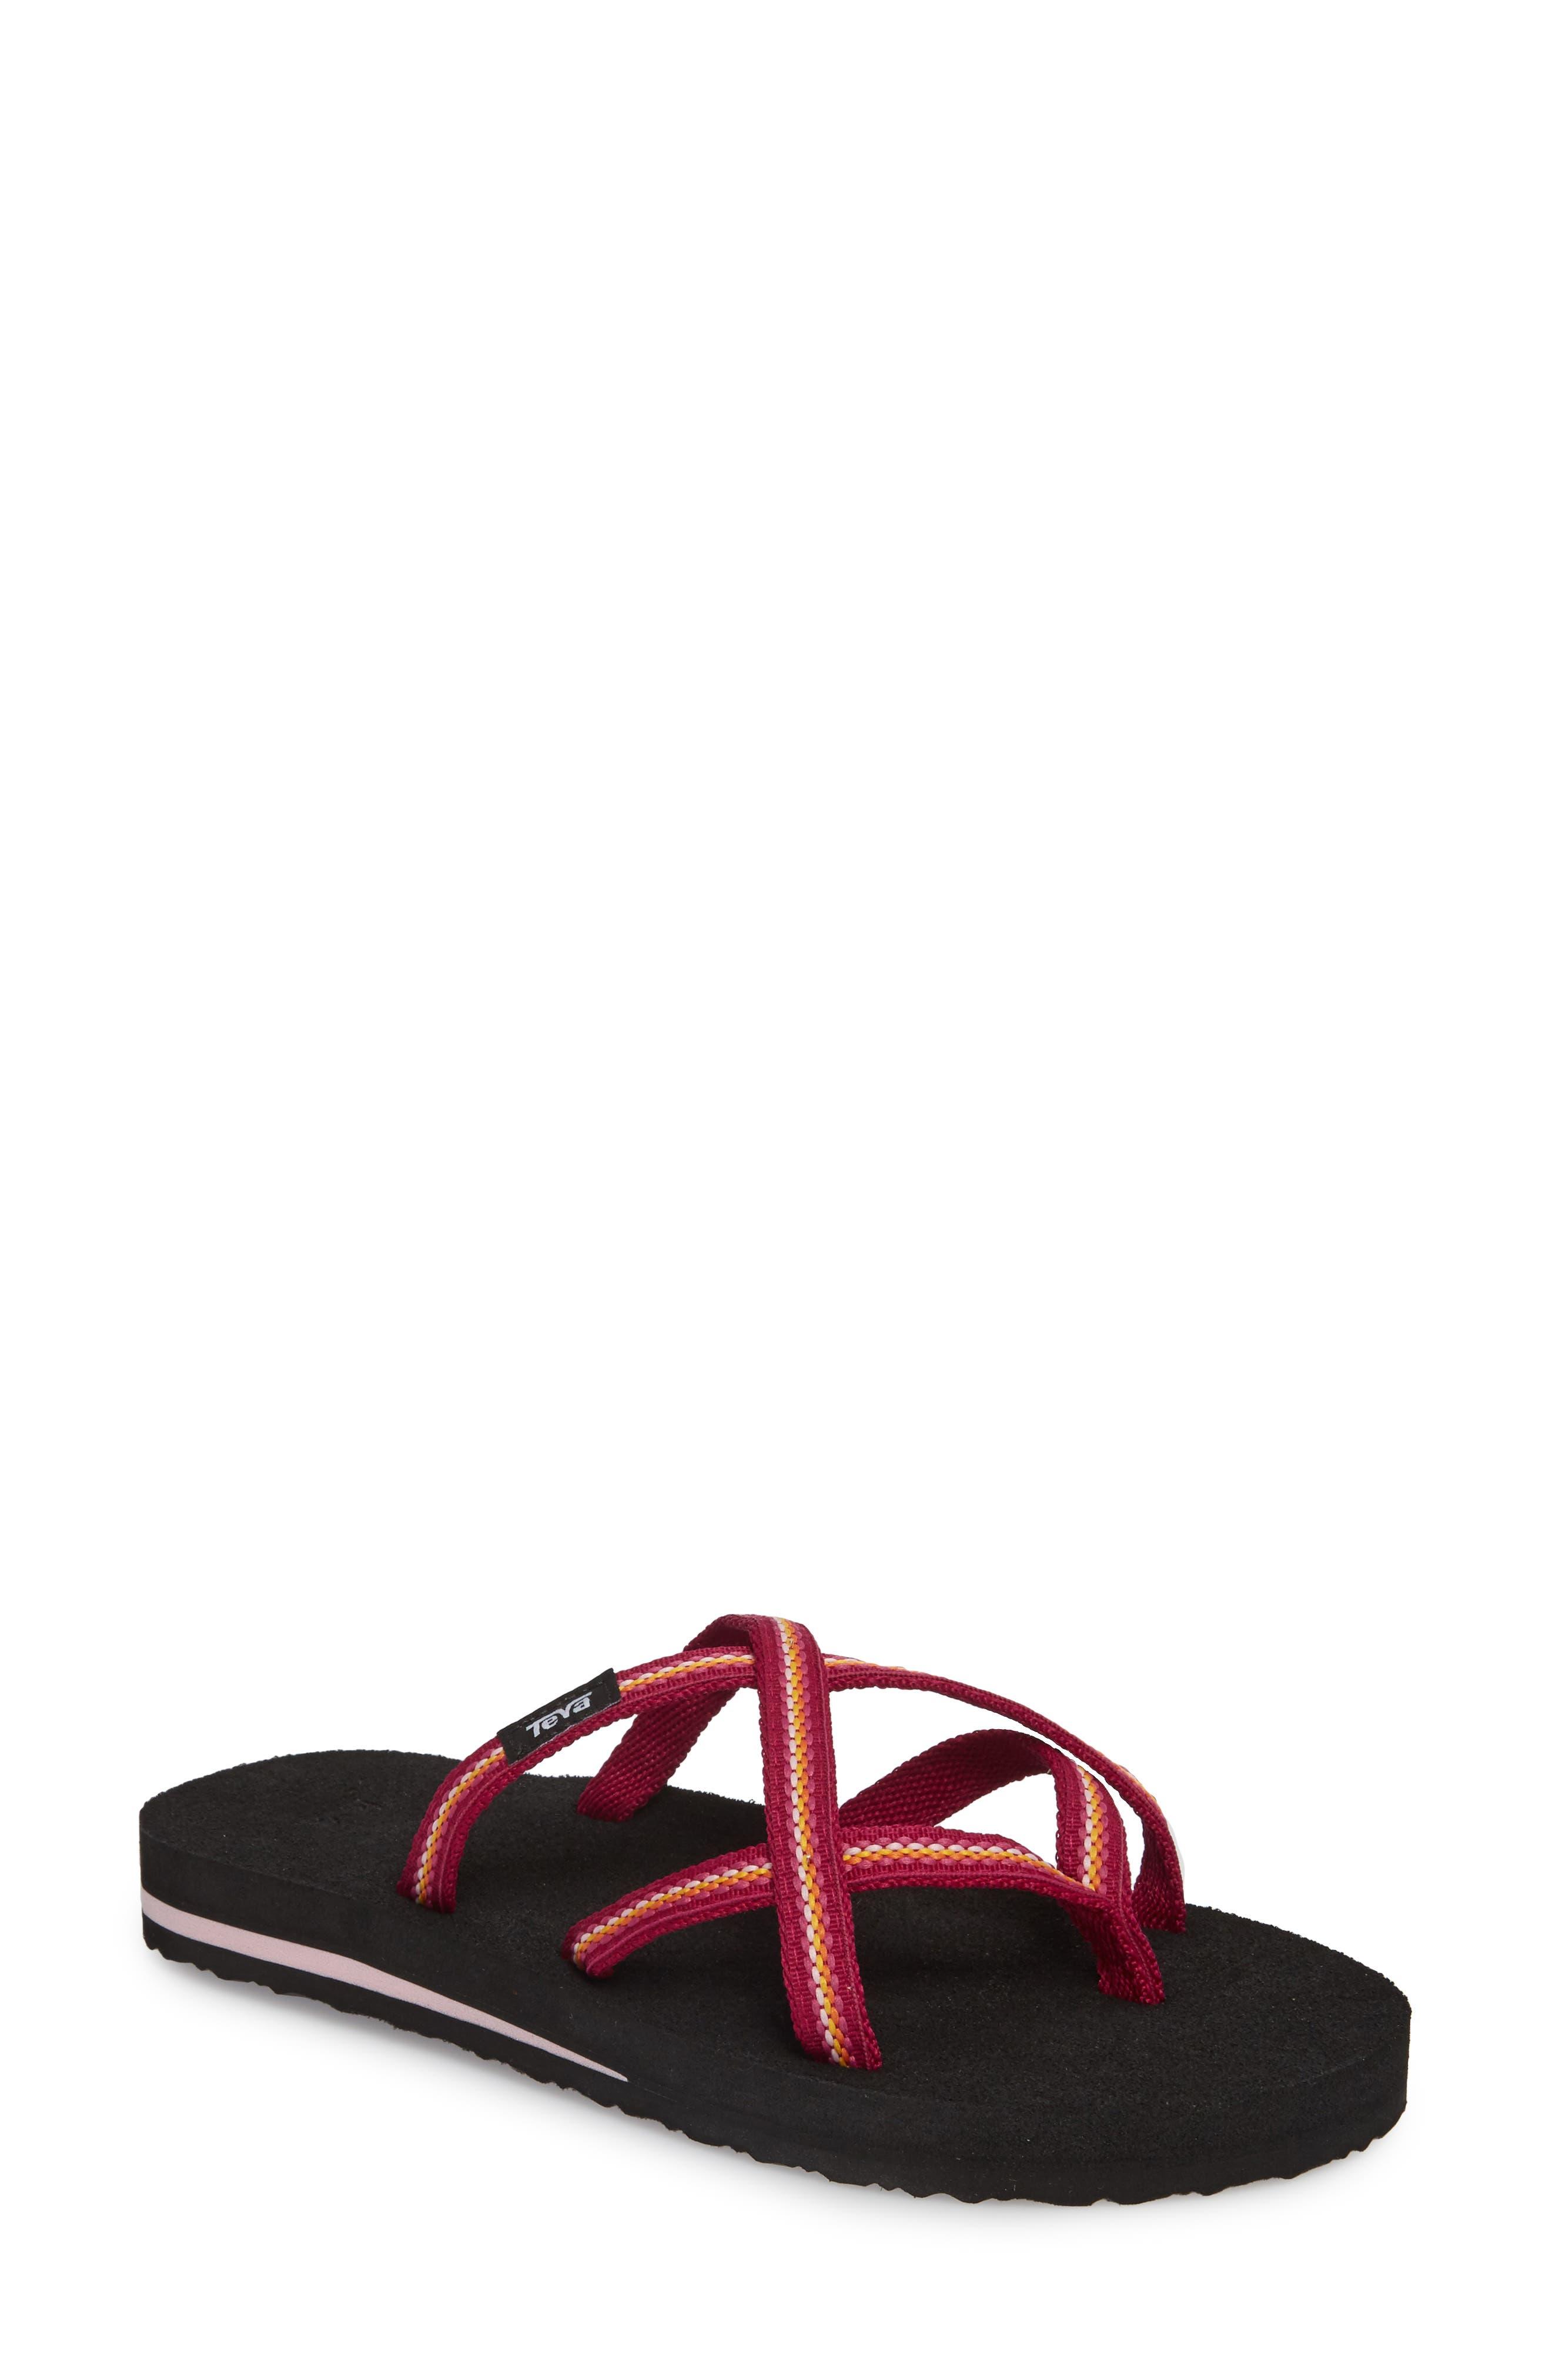 TEVA, 'Olowahu' Sandal, Main thumbnail 1, color, BOYSENBERRY FABRIC